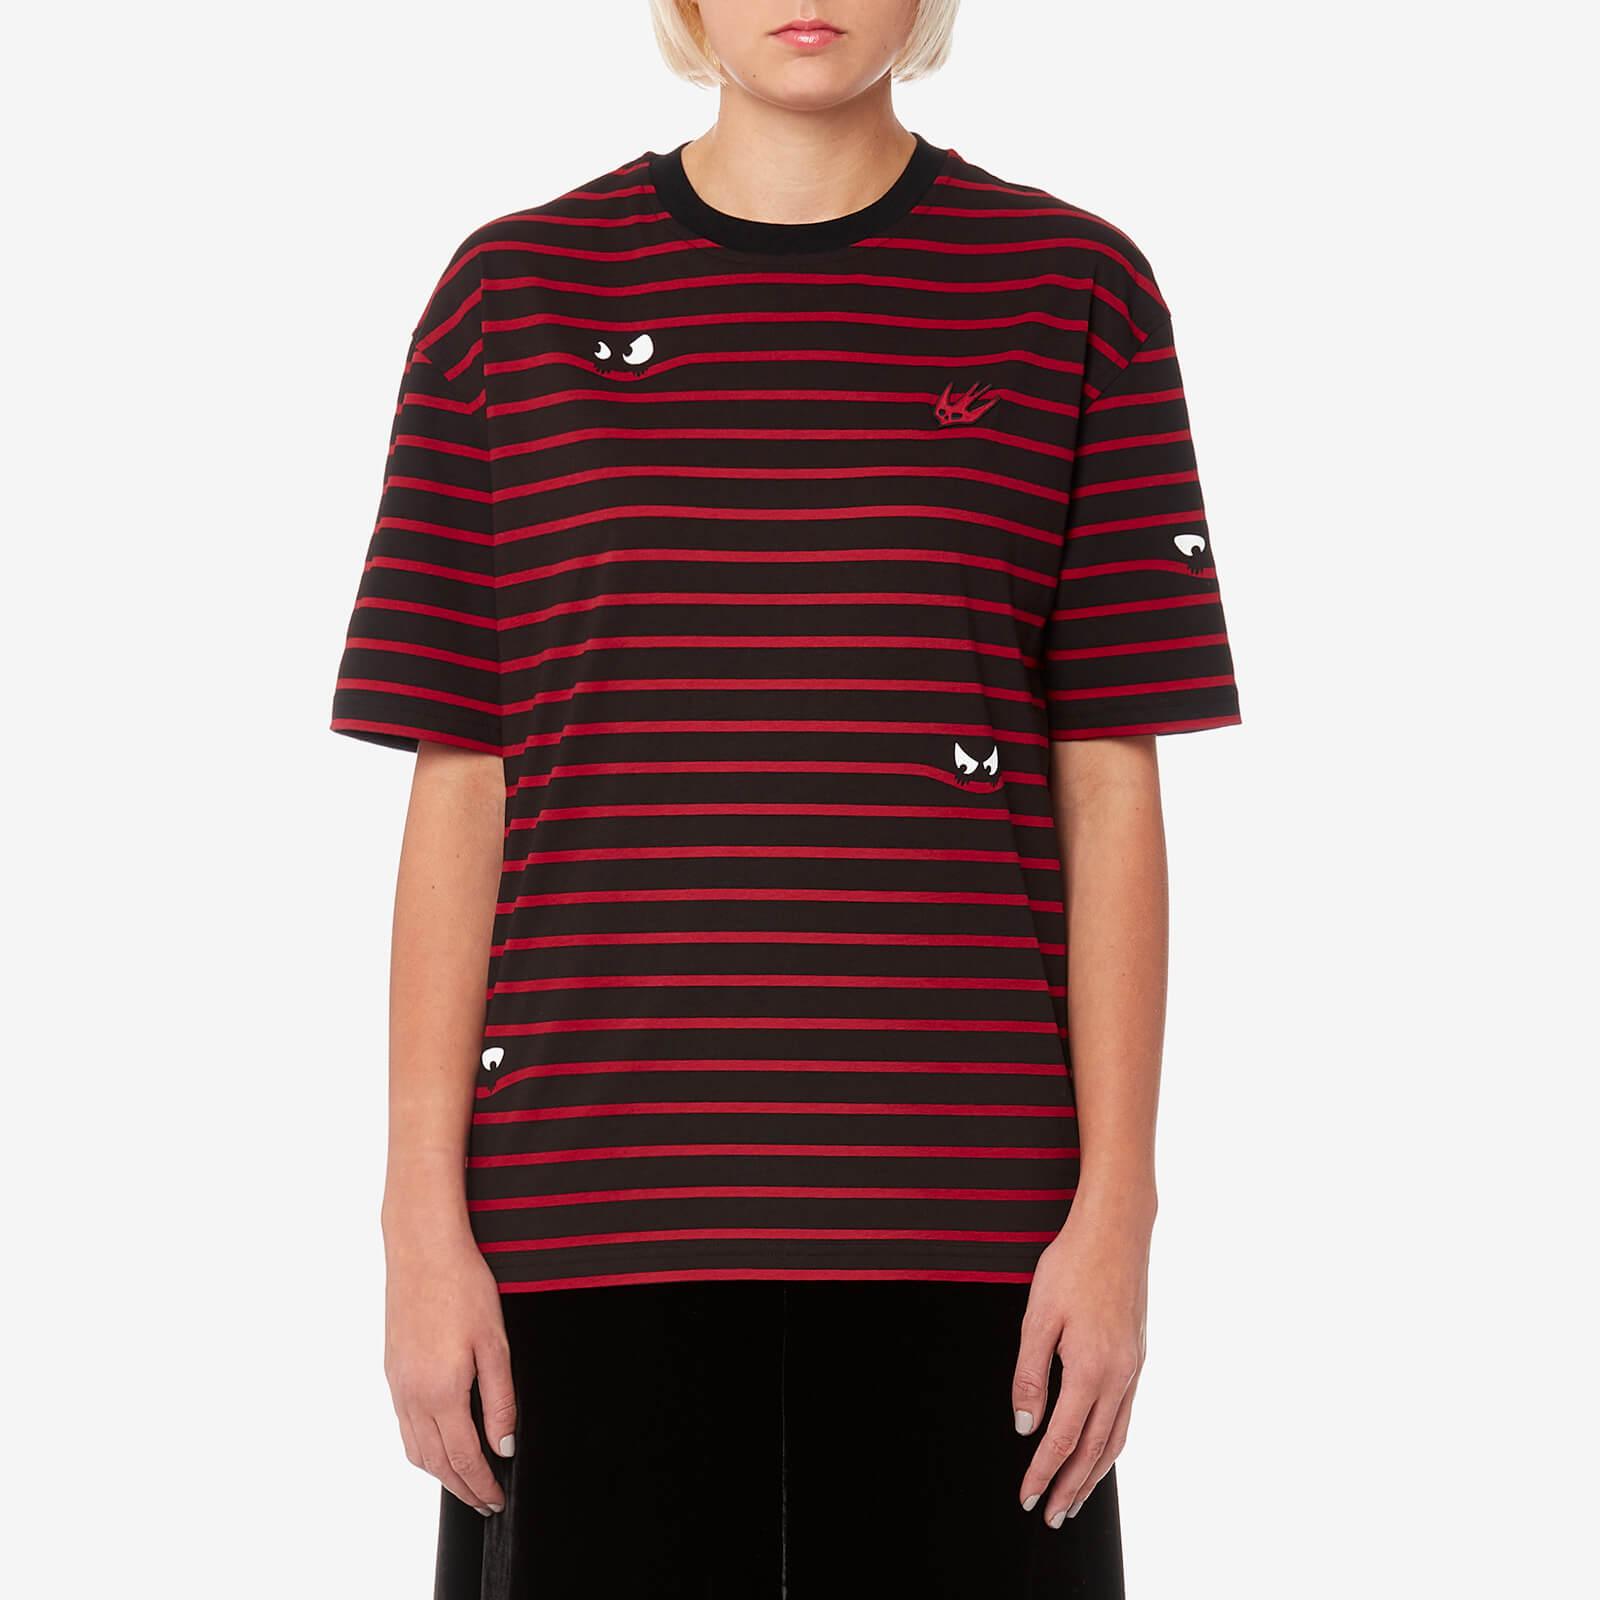 87e42c18 McQ Alexander McQueen Women's Boyfriend Stripe T-Shirt - Striped Black/Red  - Free UK Delivery over £50